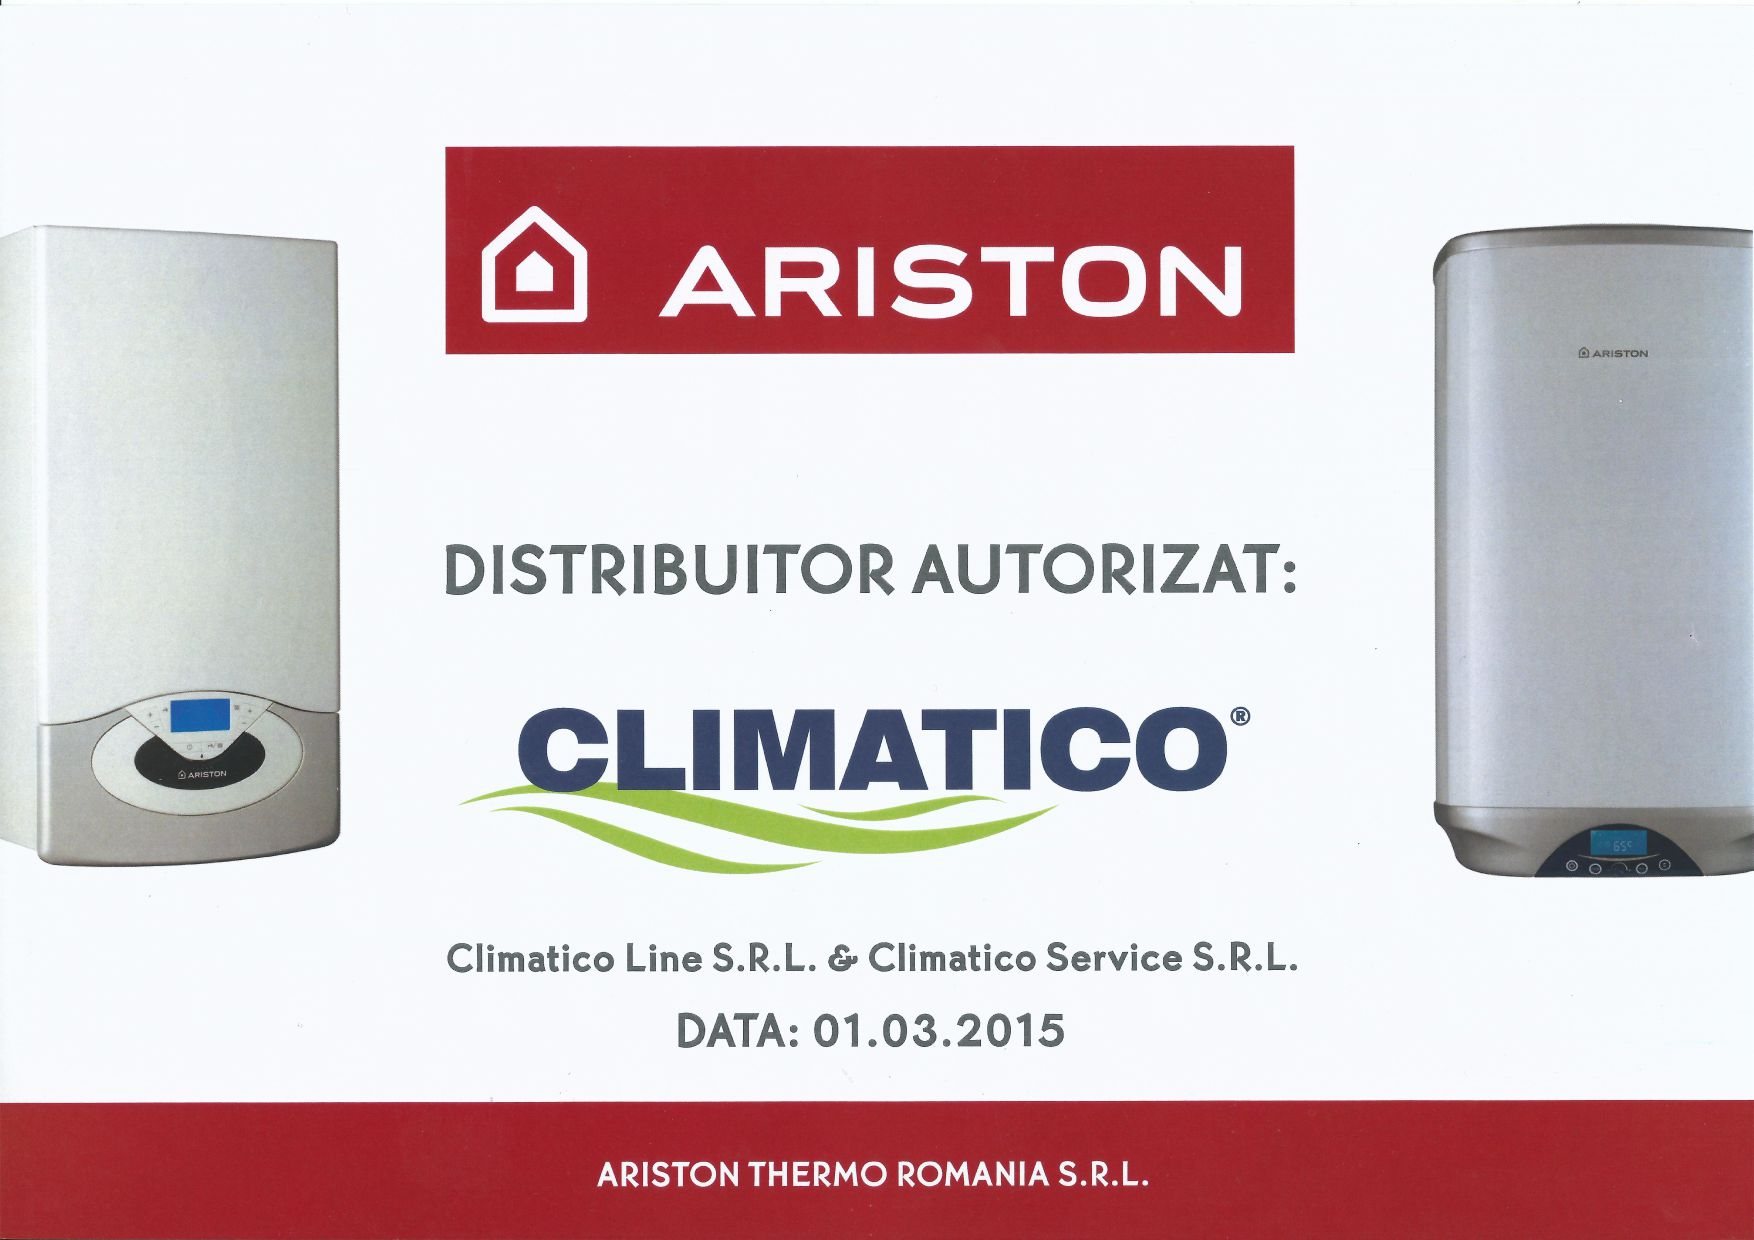 Climatico distribuitor autorizat Ariston